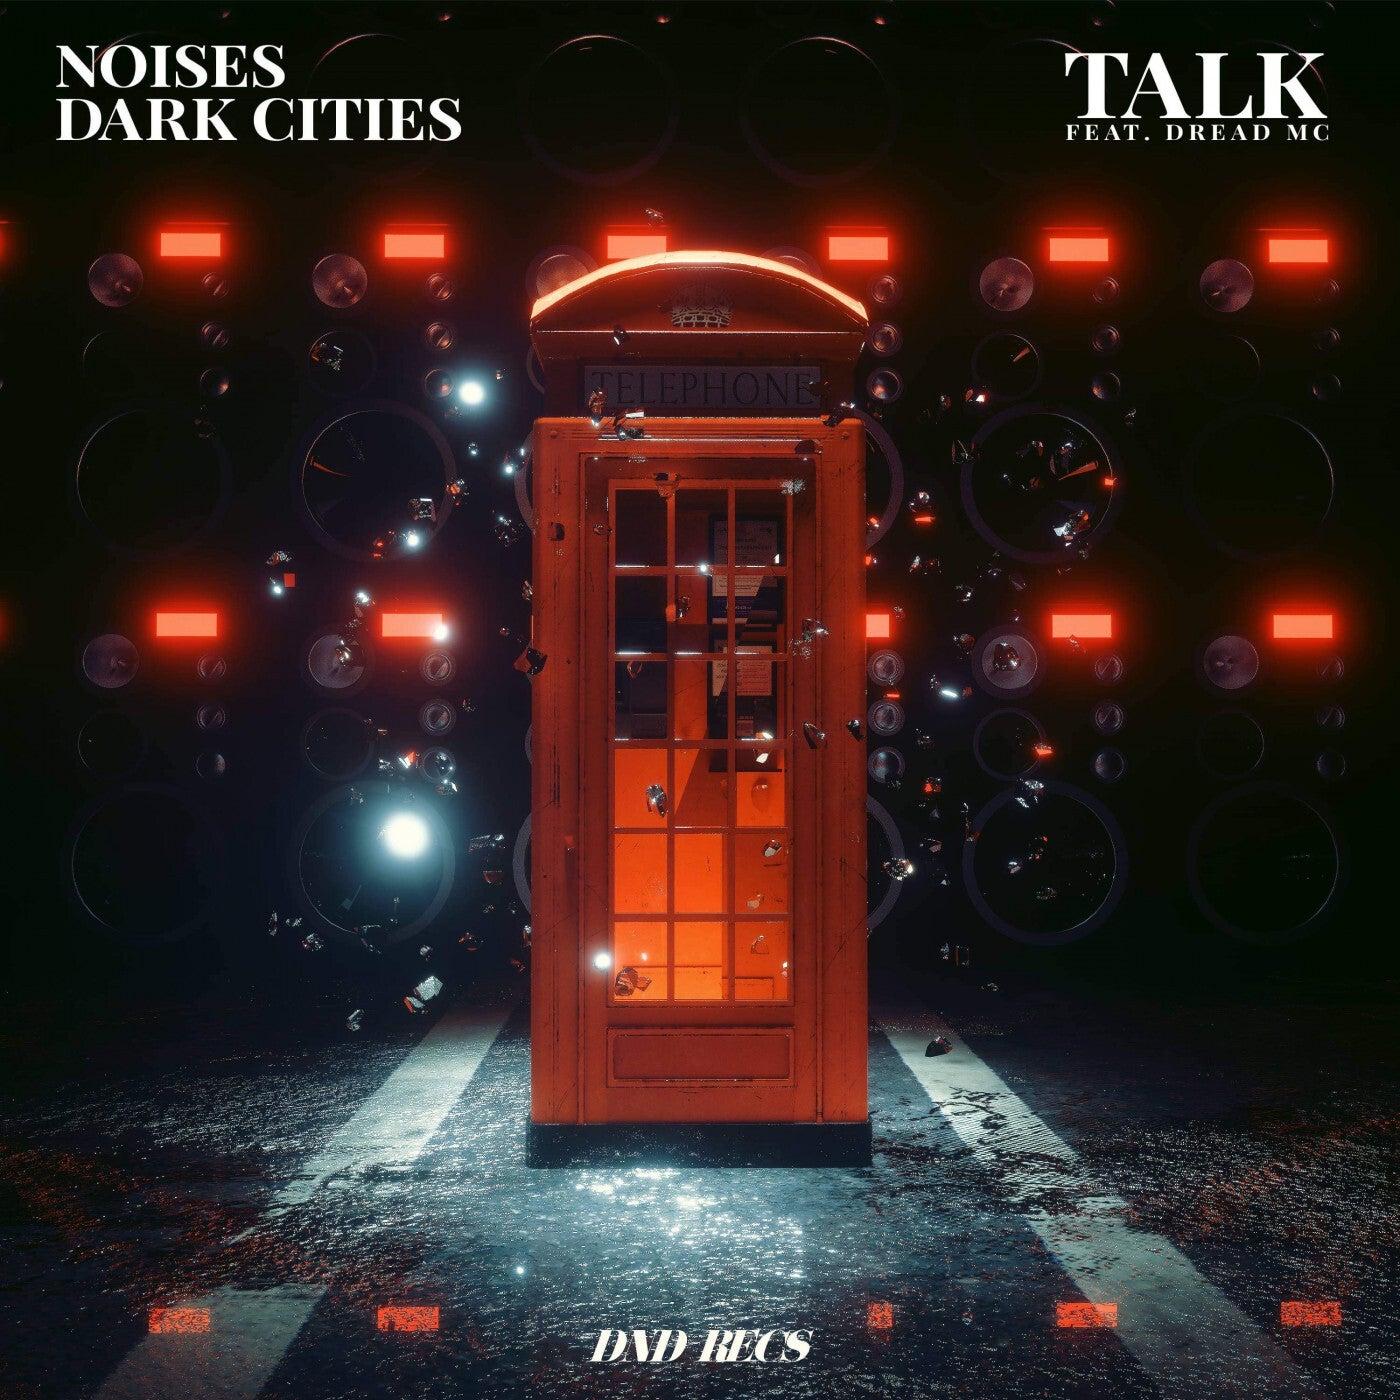 Talk (feat. Dread MC) (Extended)